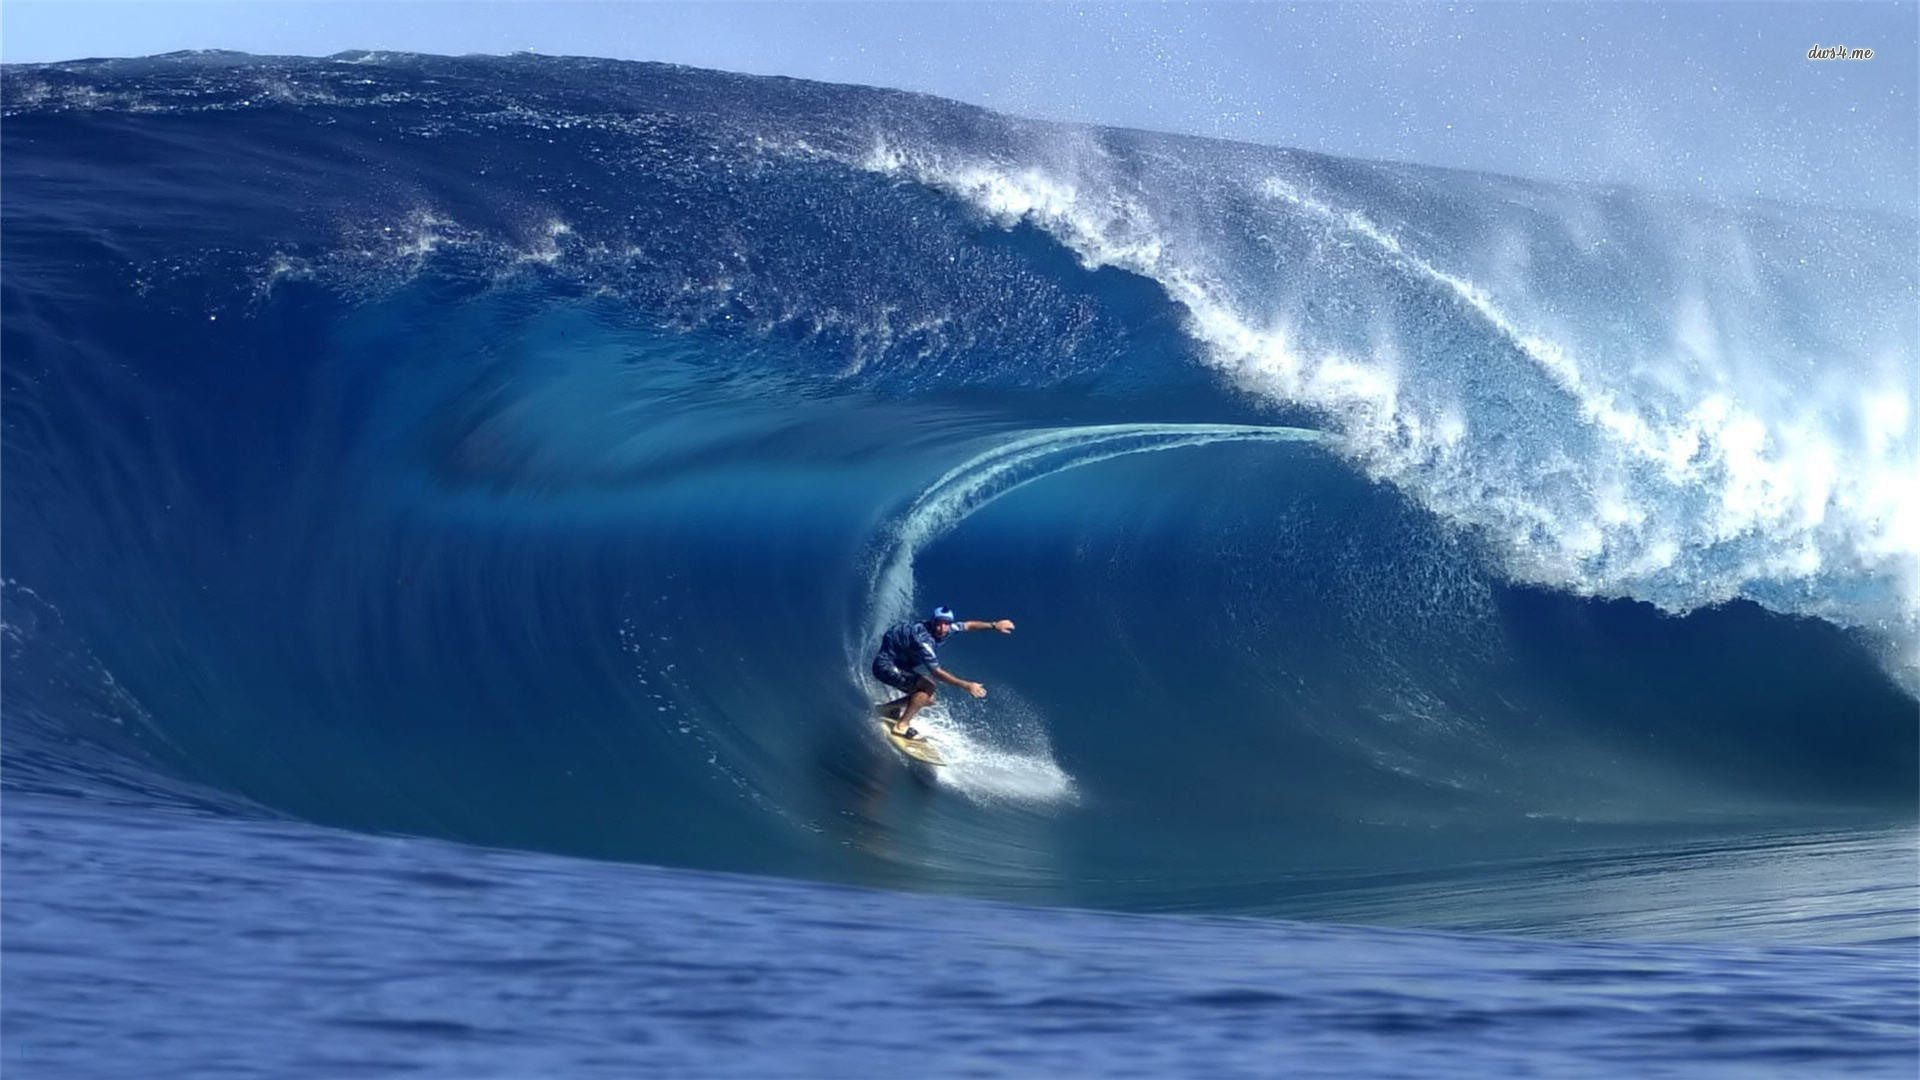 Surfer wallpaper – Sport wallpapers – #14105